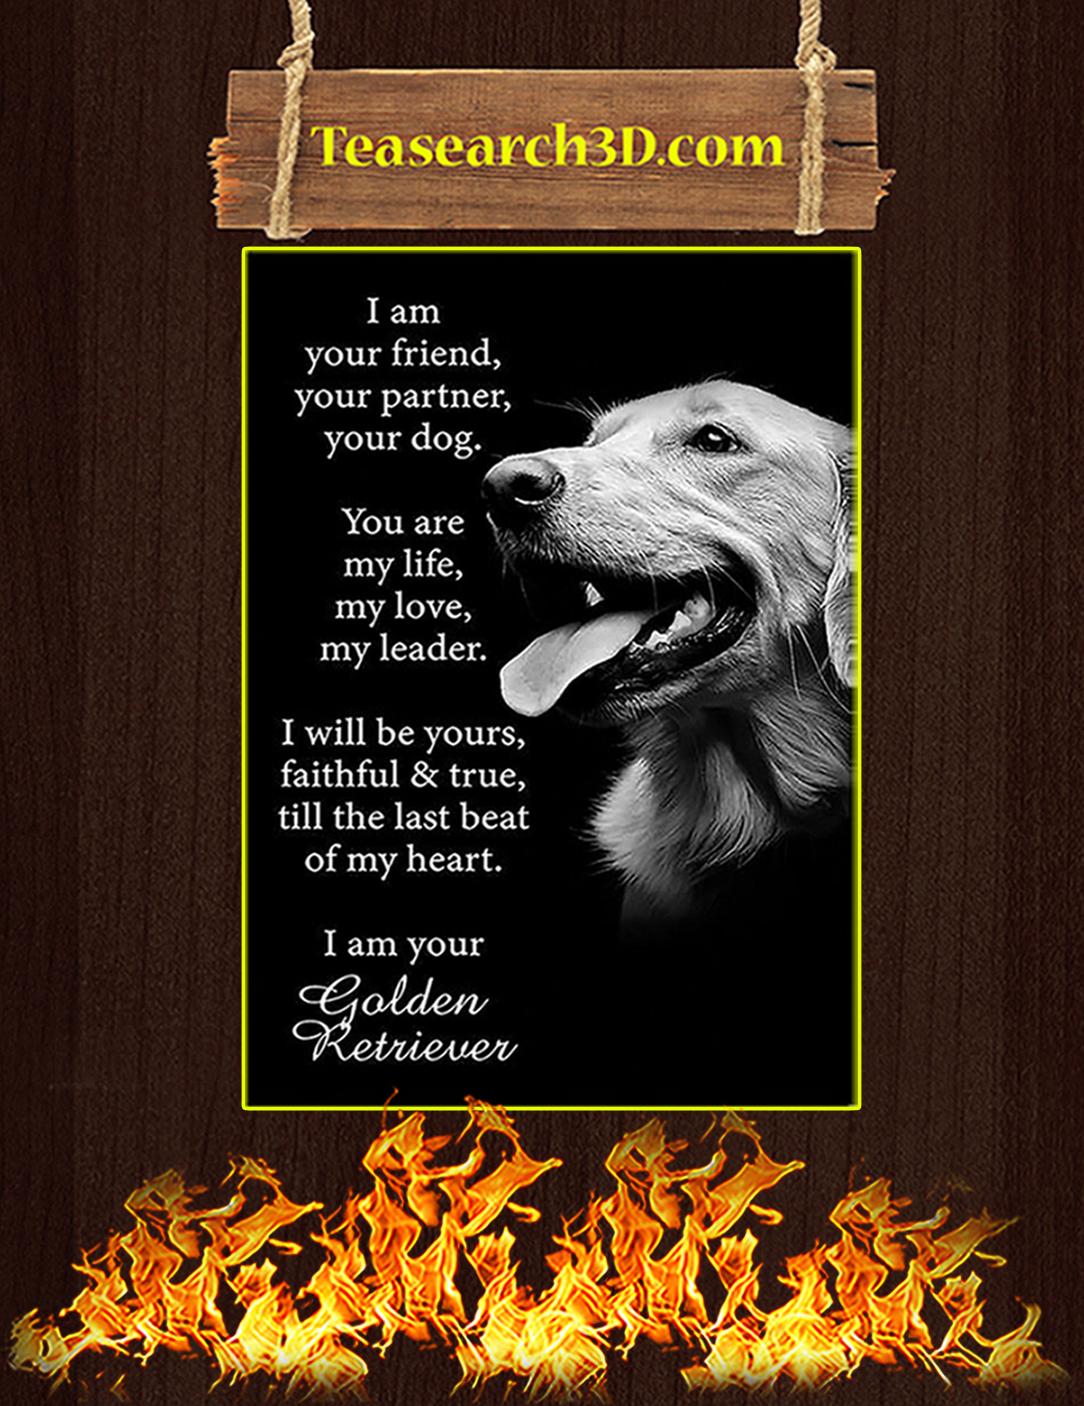 Golden retriever I am your friend your partner your dog poster A2